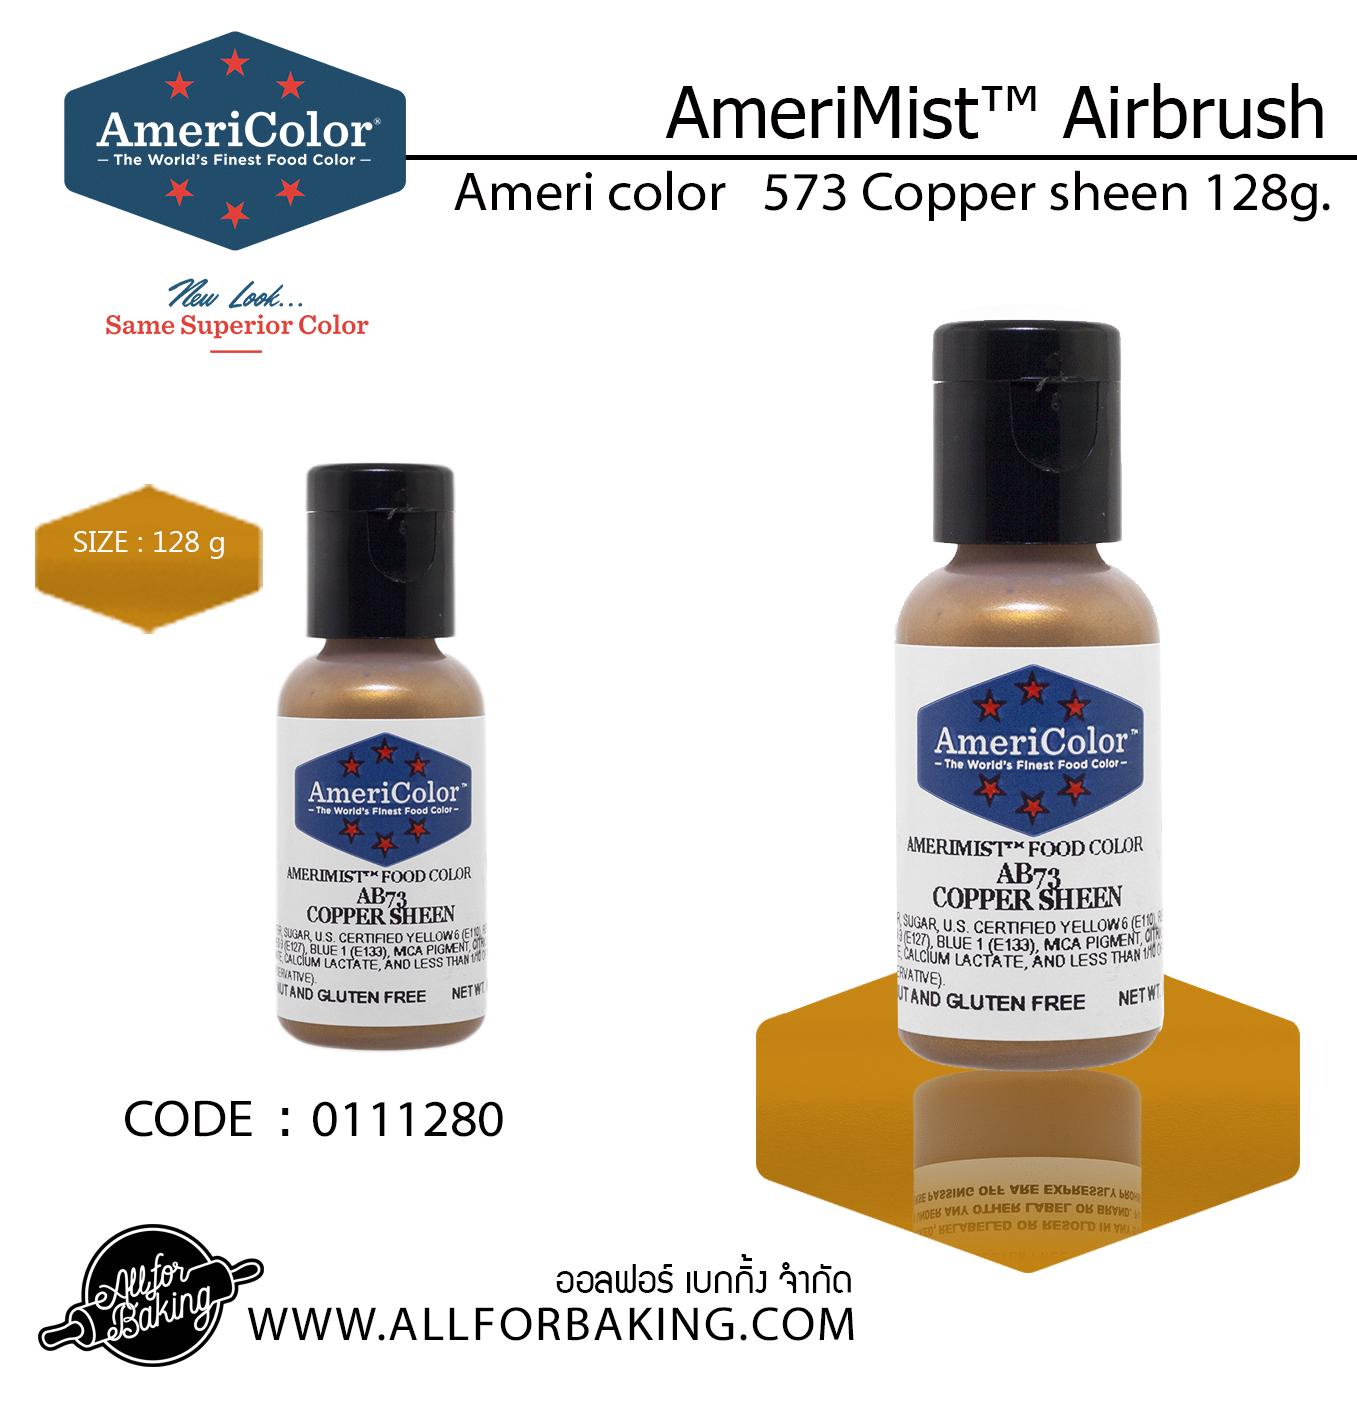 Ameri color 573 Copper sheen 128g. (128 g)